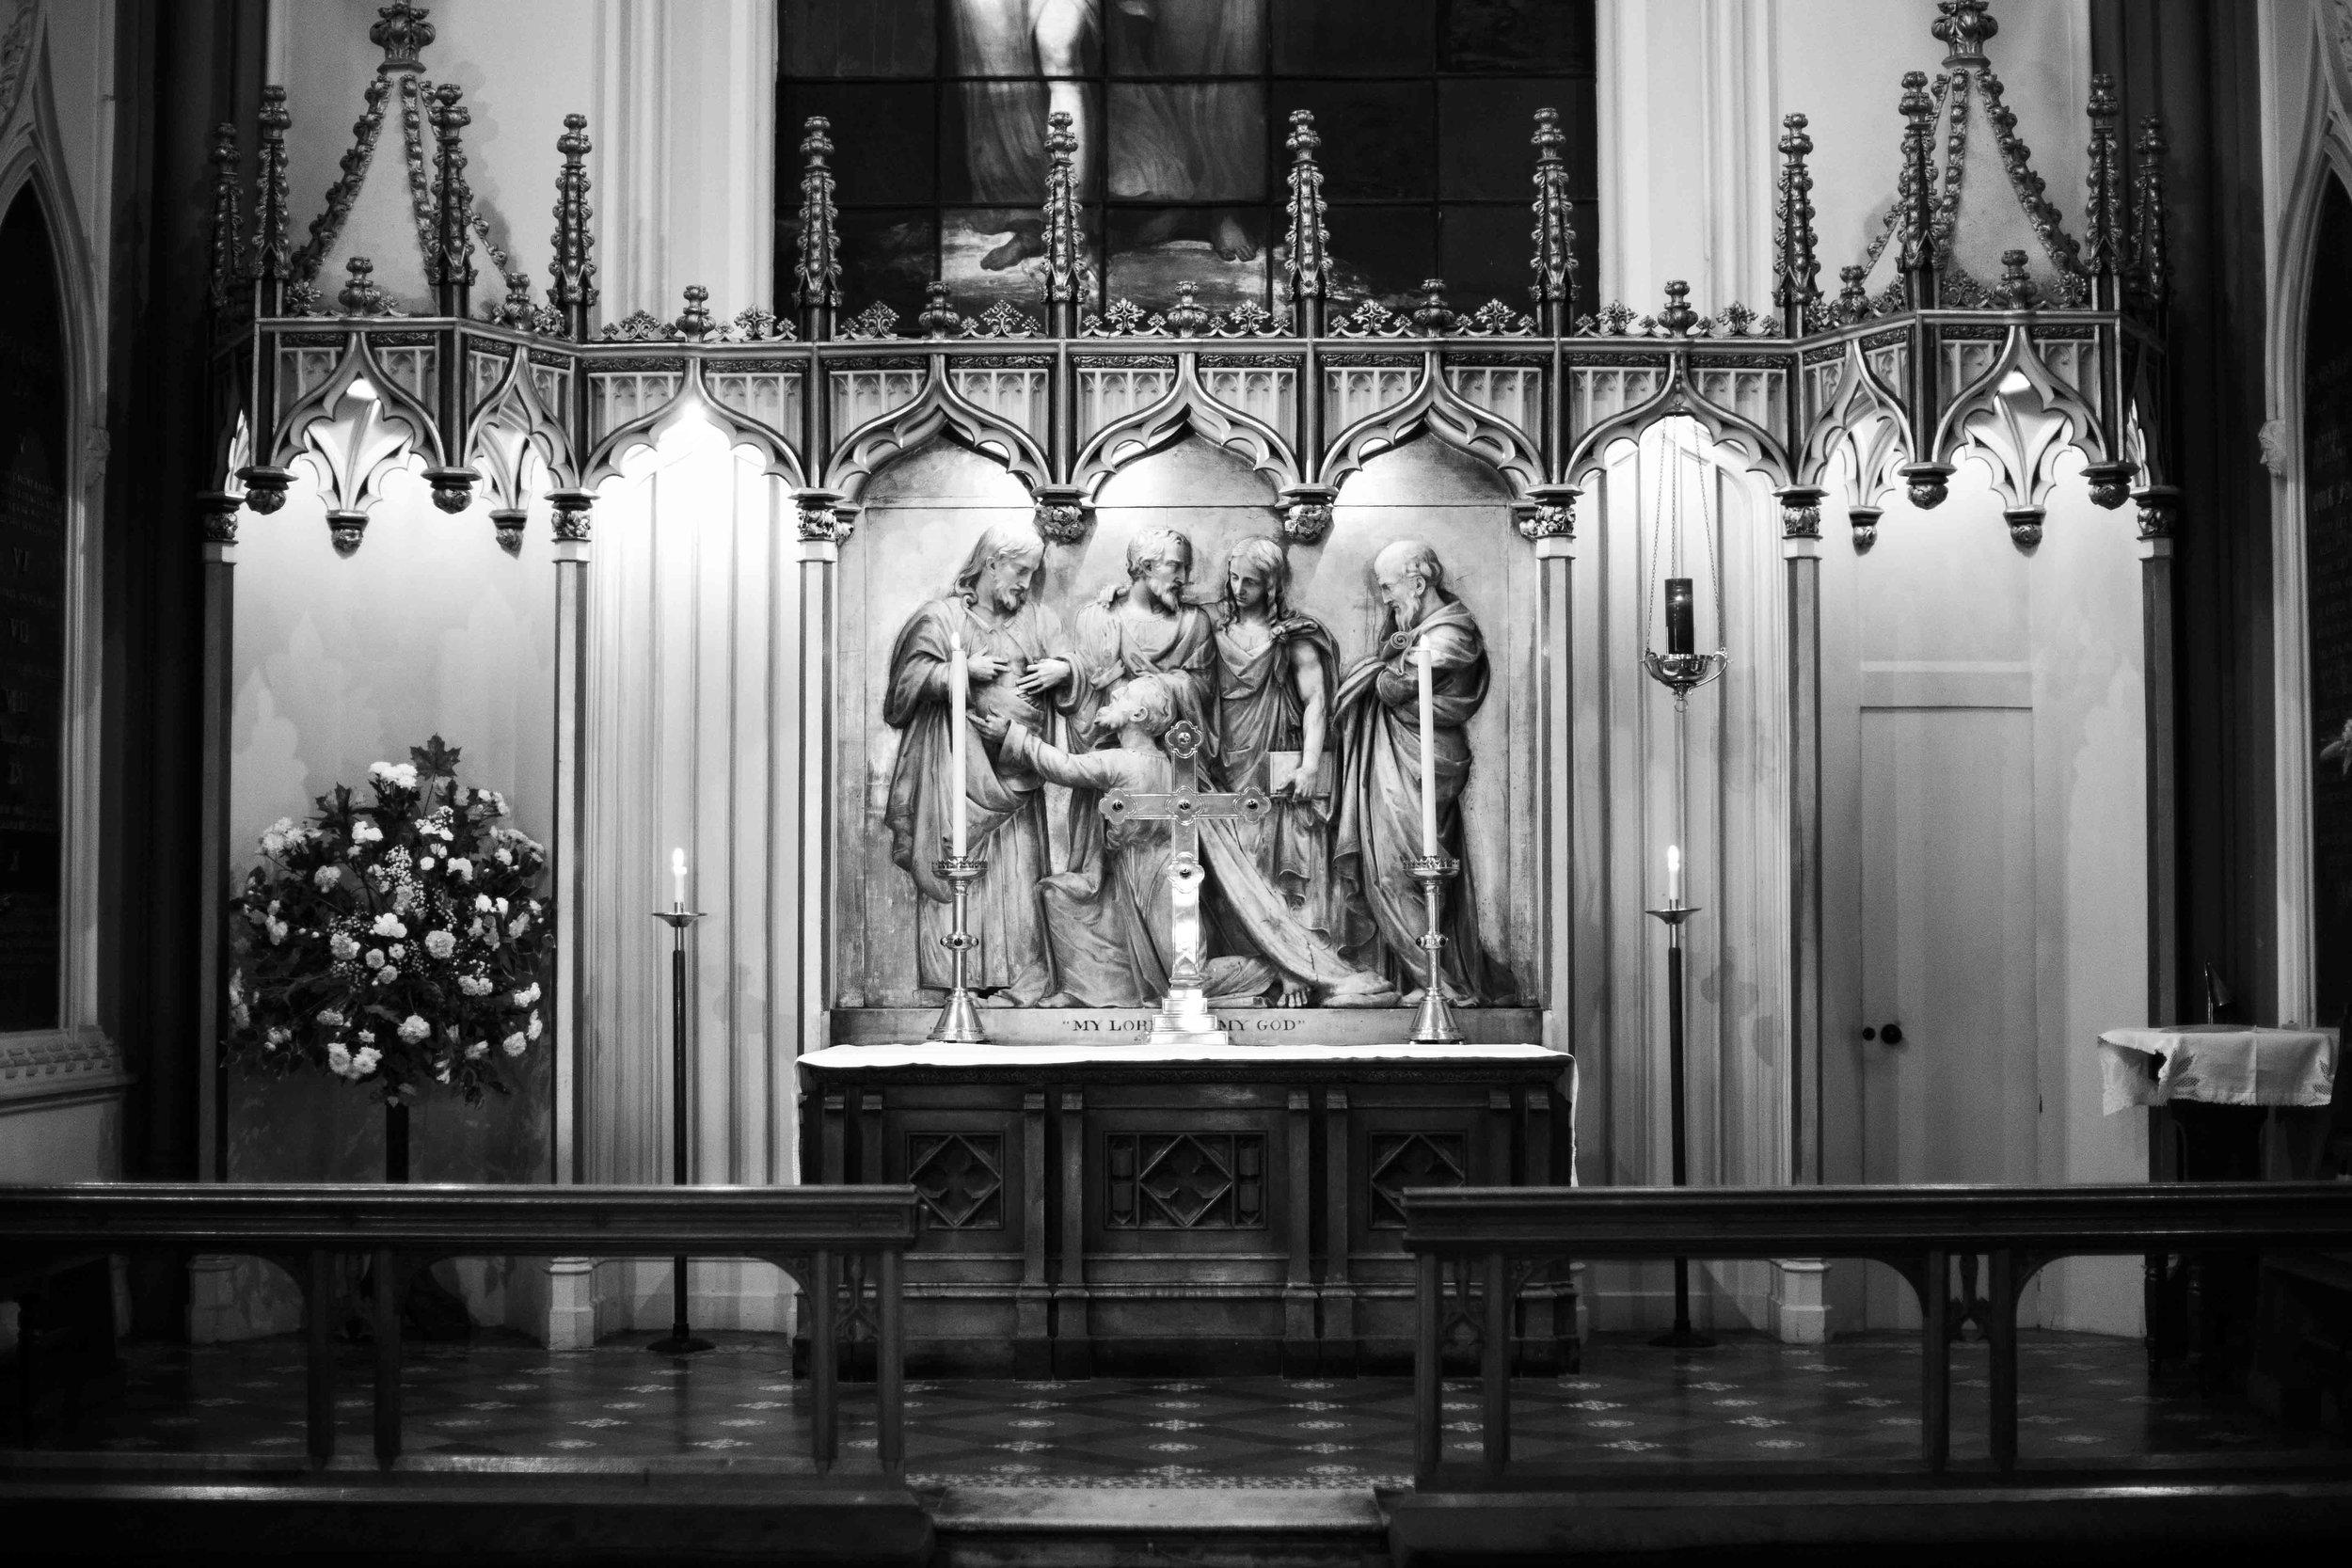 Lea-cooper-photography-christening-photographer-baptism-wolverhampton-wednesbury-walsall-willenhall-dudley-church-chapel-event-photography-2.jpg